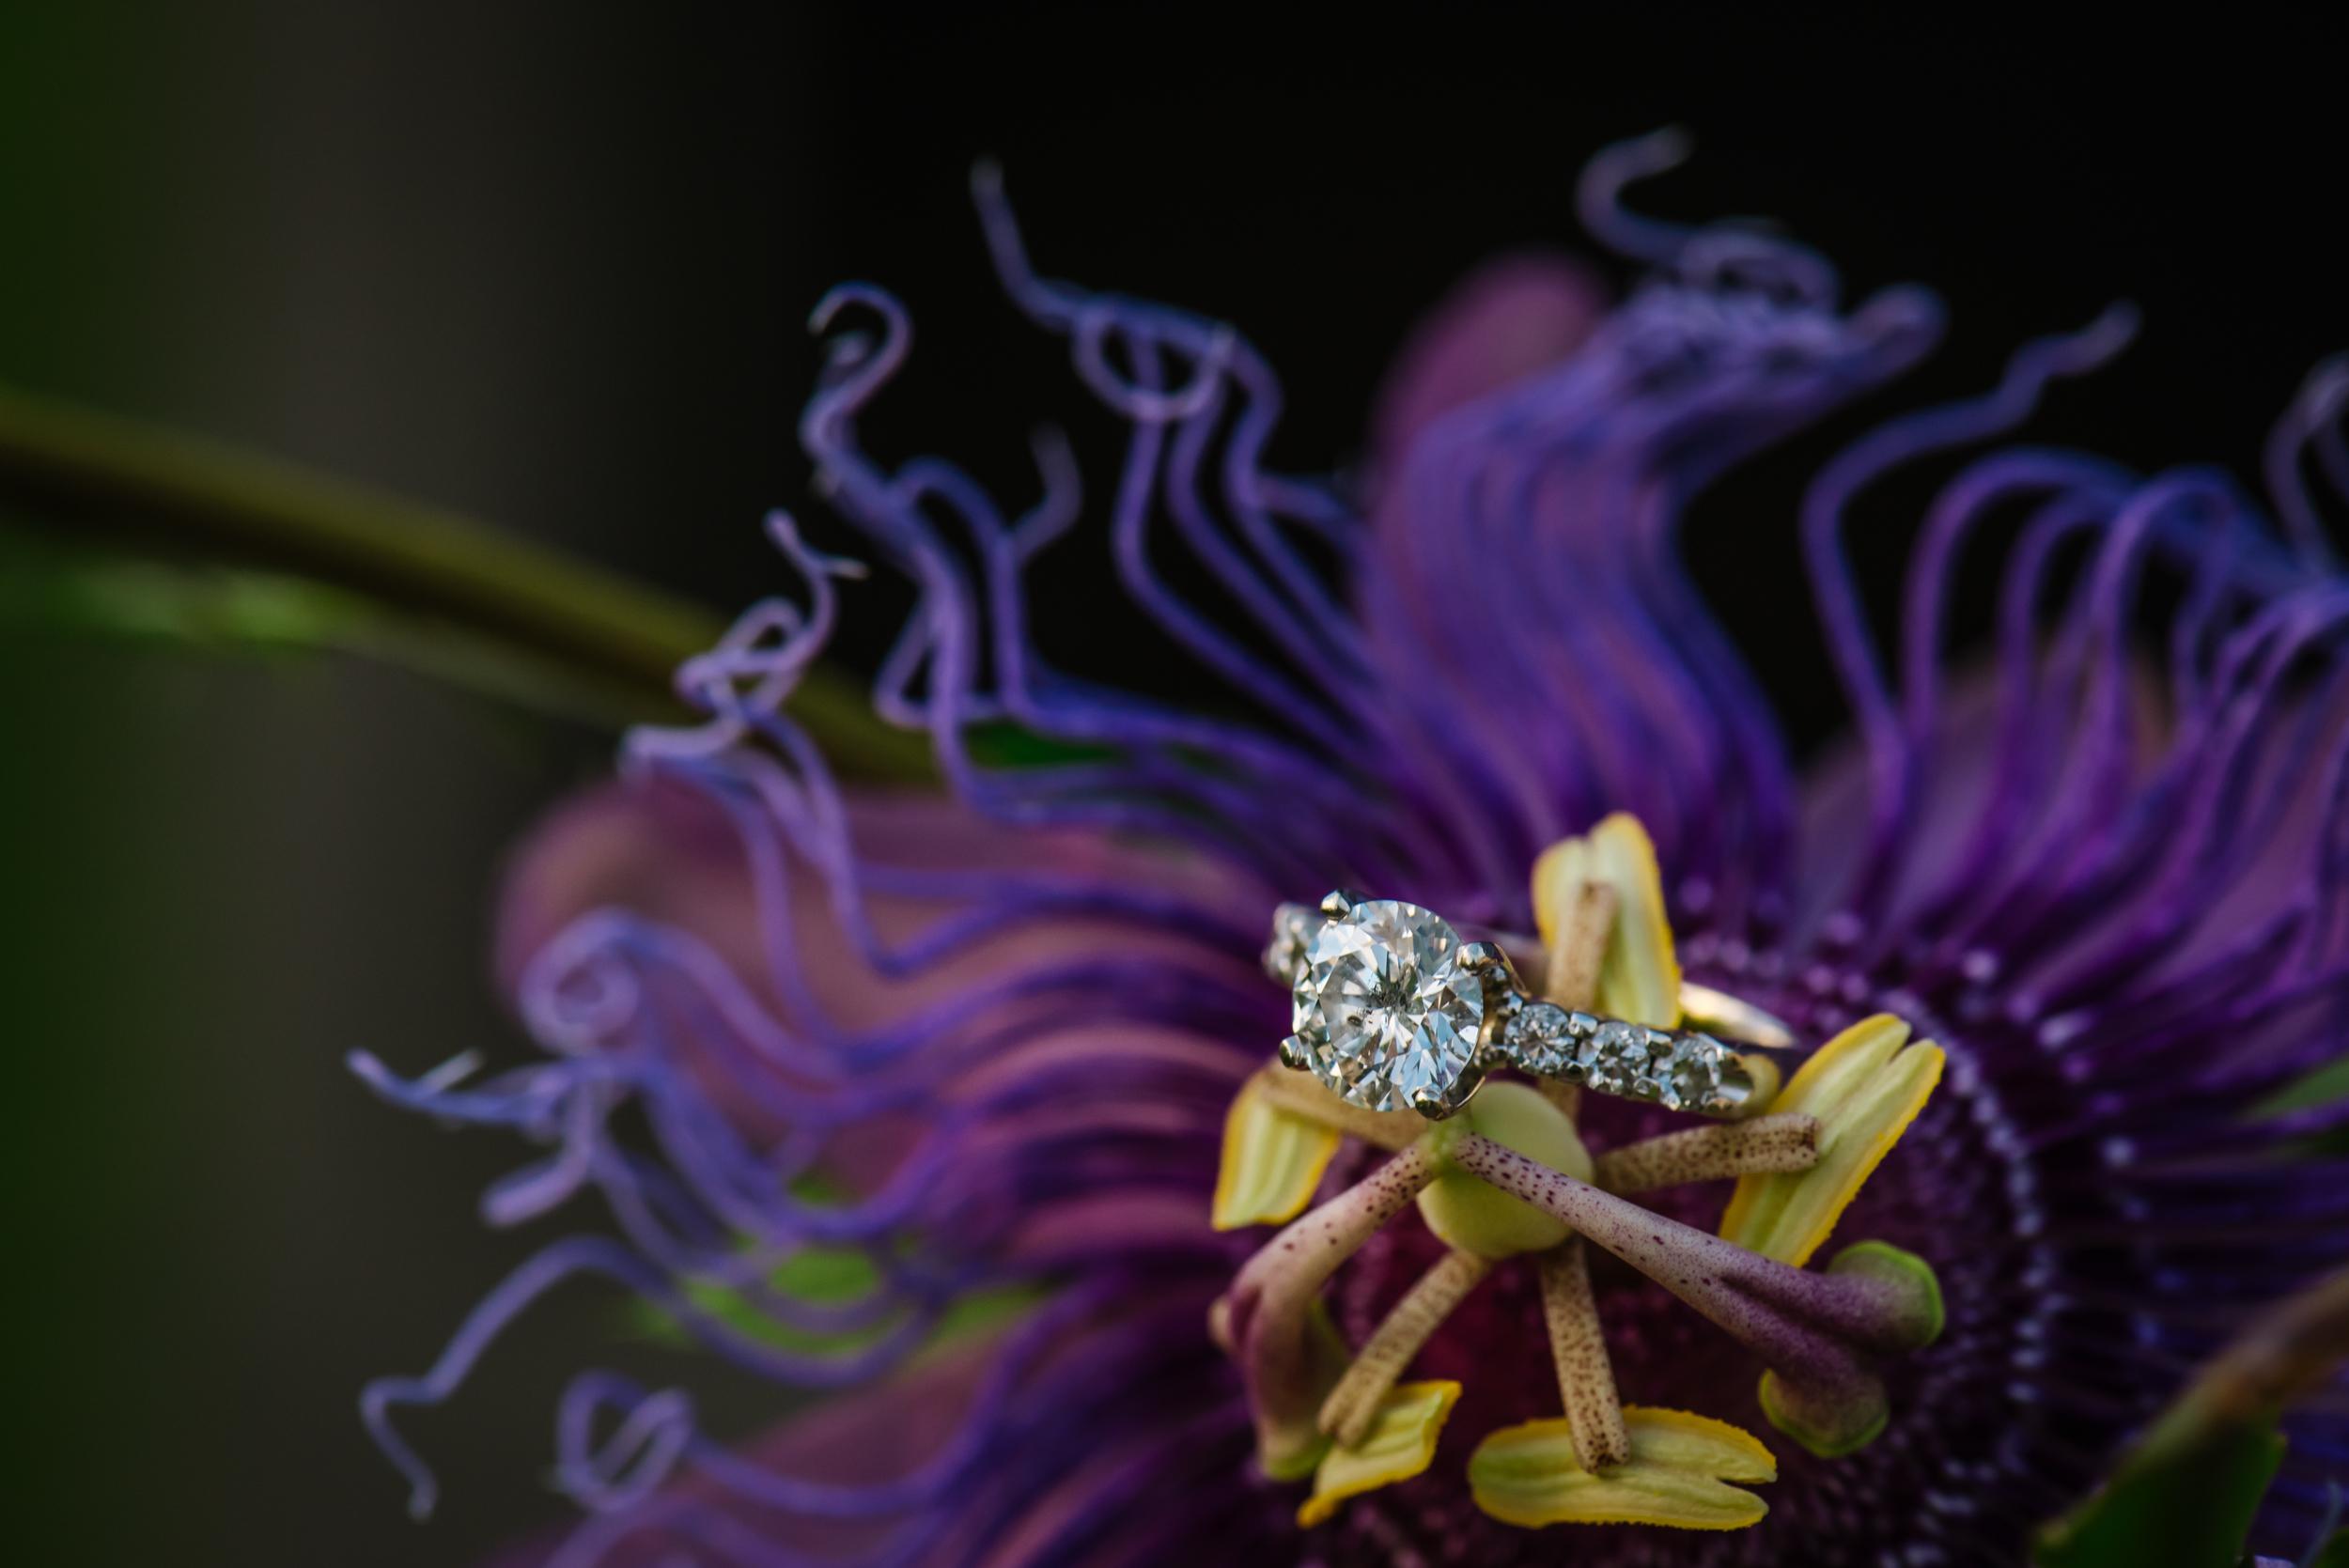 tampa-engagement-photographer-ring-purple-flower-palm-harbor-backyard-dunedin